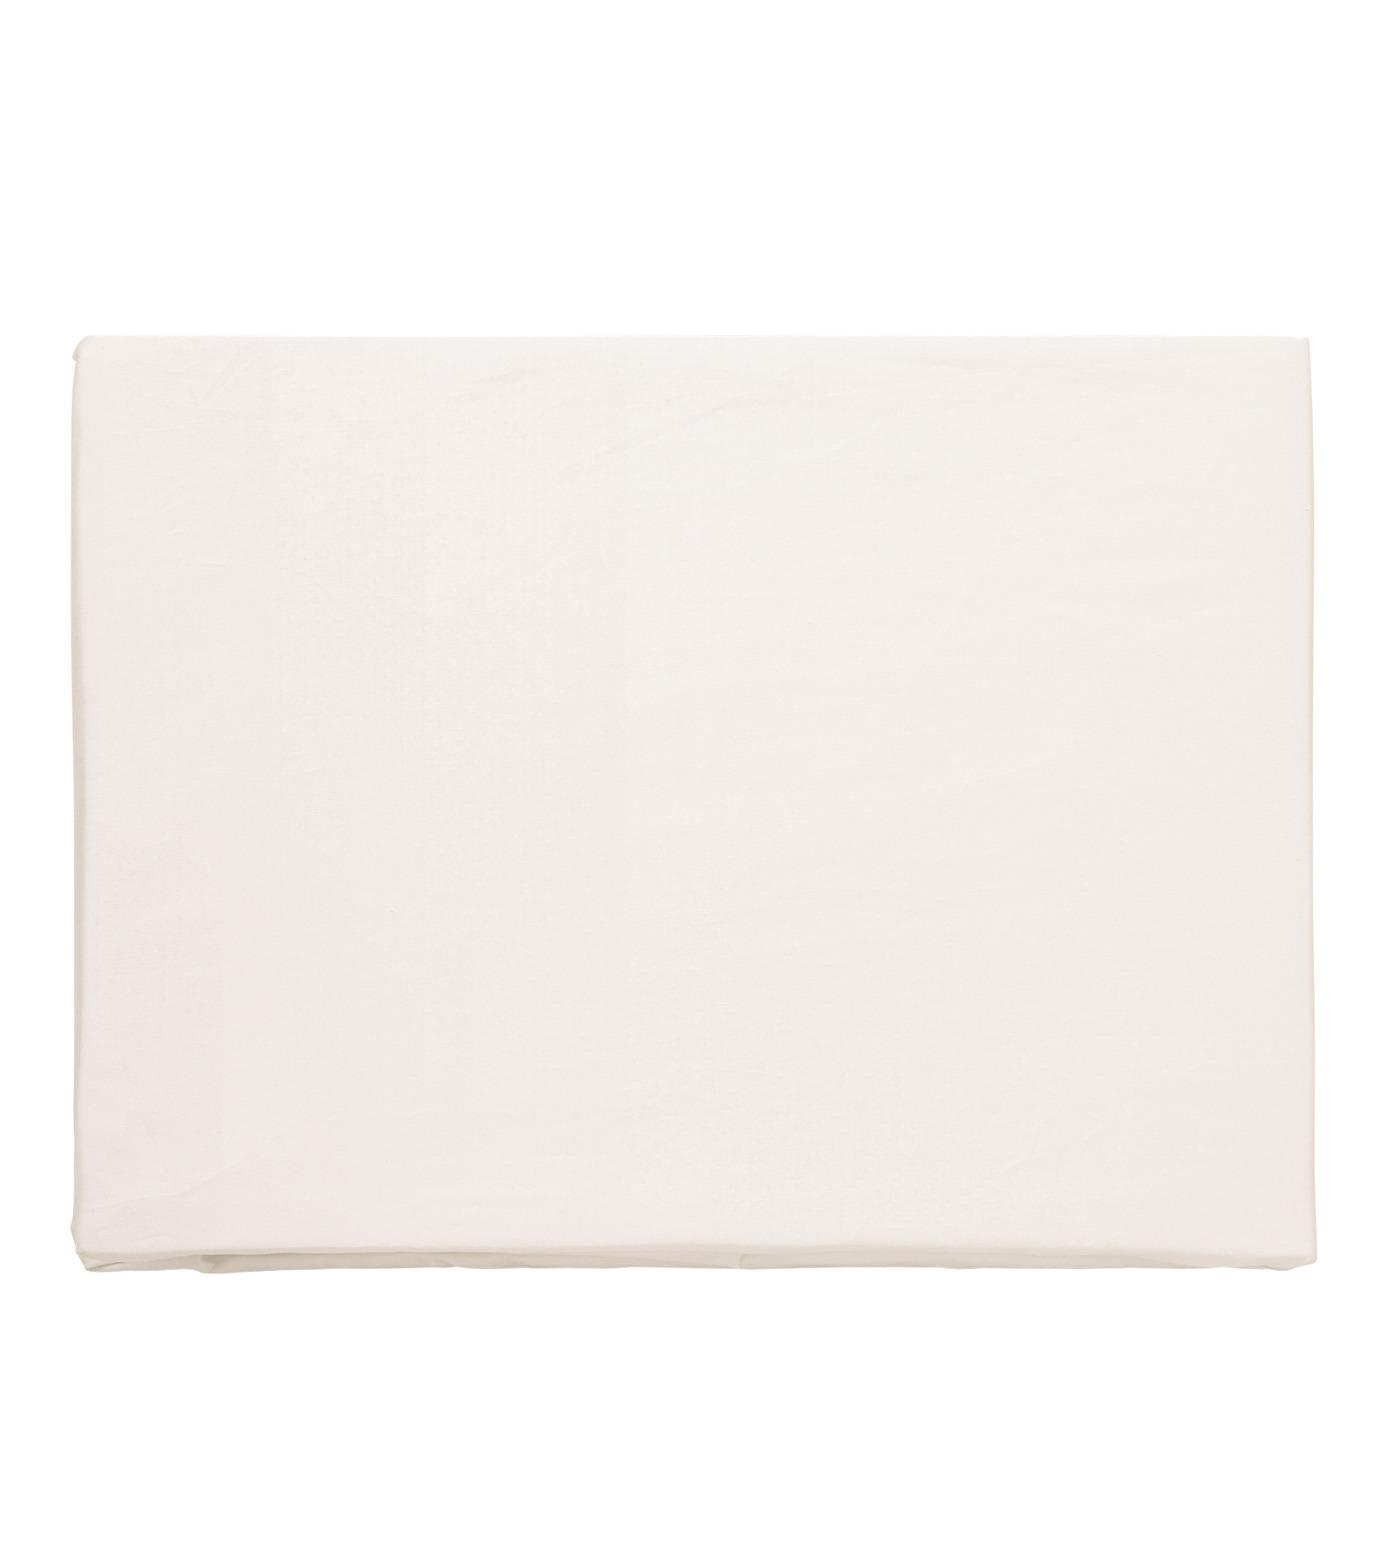 HEY YOU !(ヘイユウ)のBox sheet1/semi double-WHITE(インテリア/interior)-box-sheet-SD-4 拡大詳細画像1